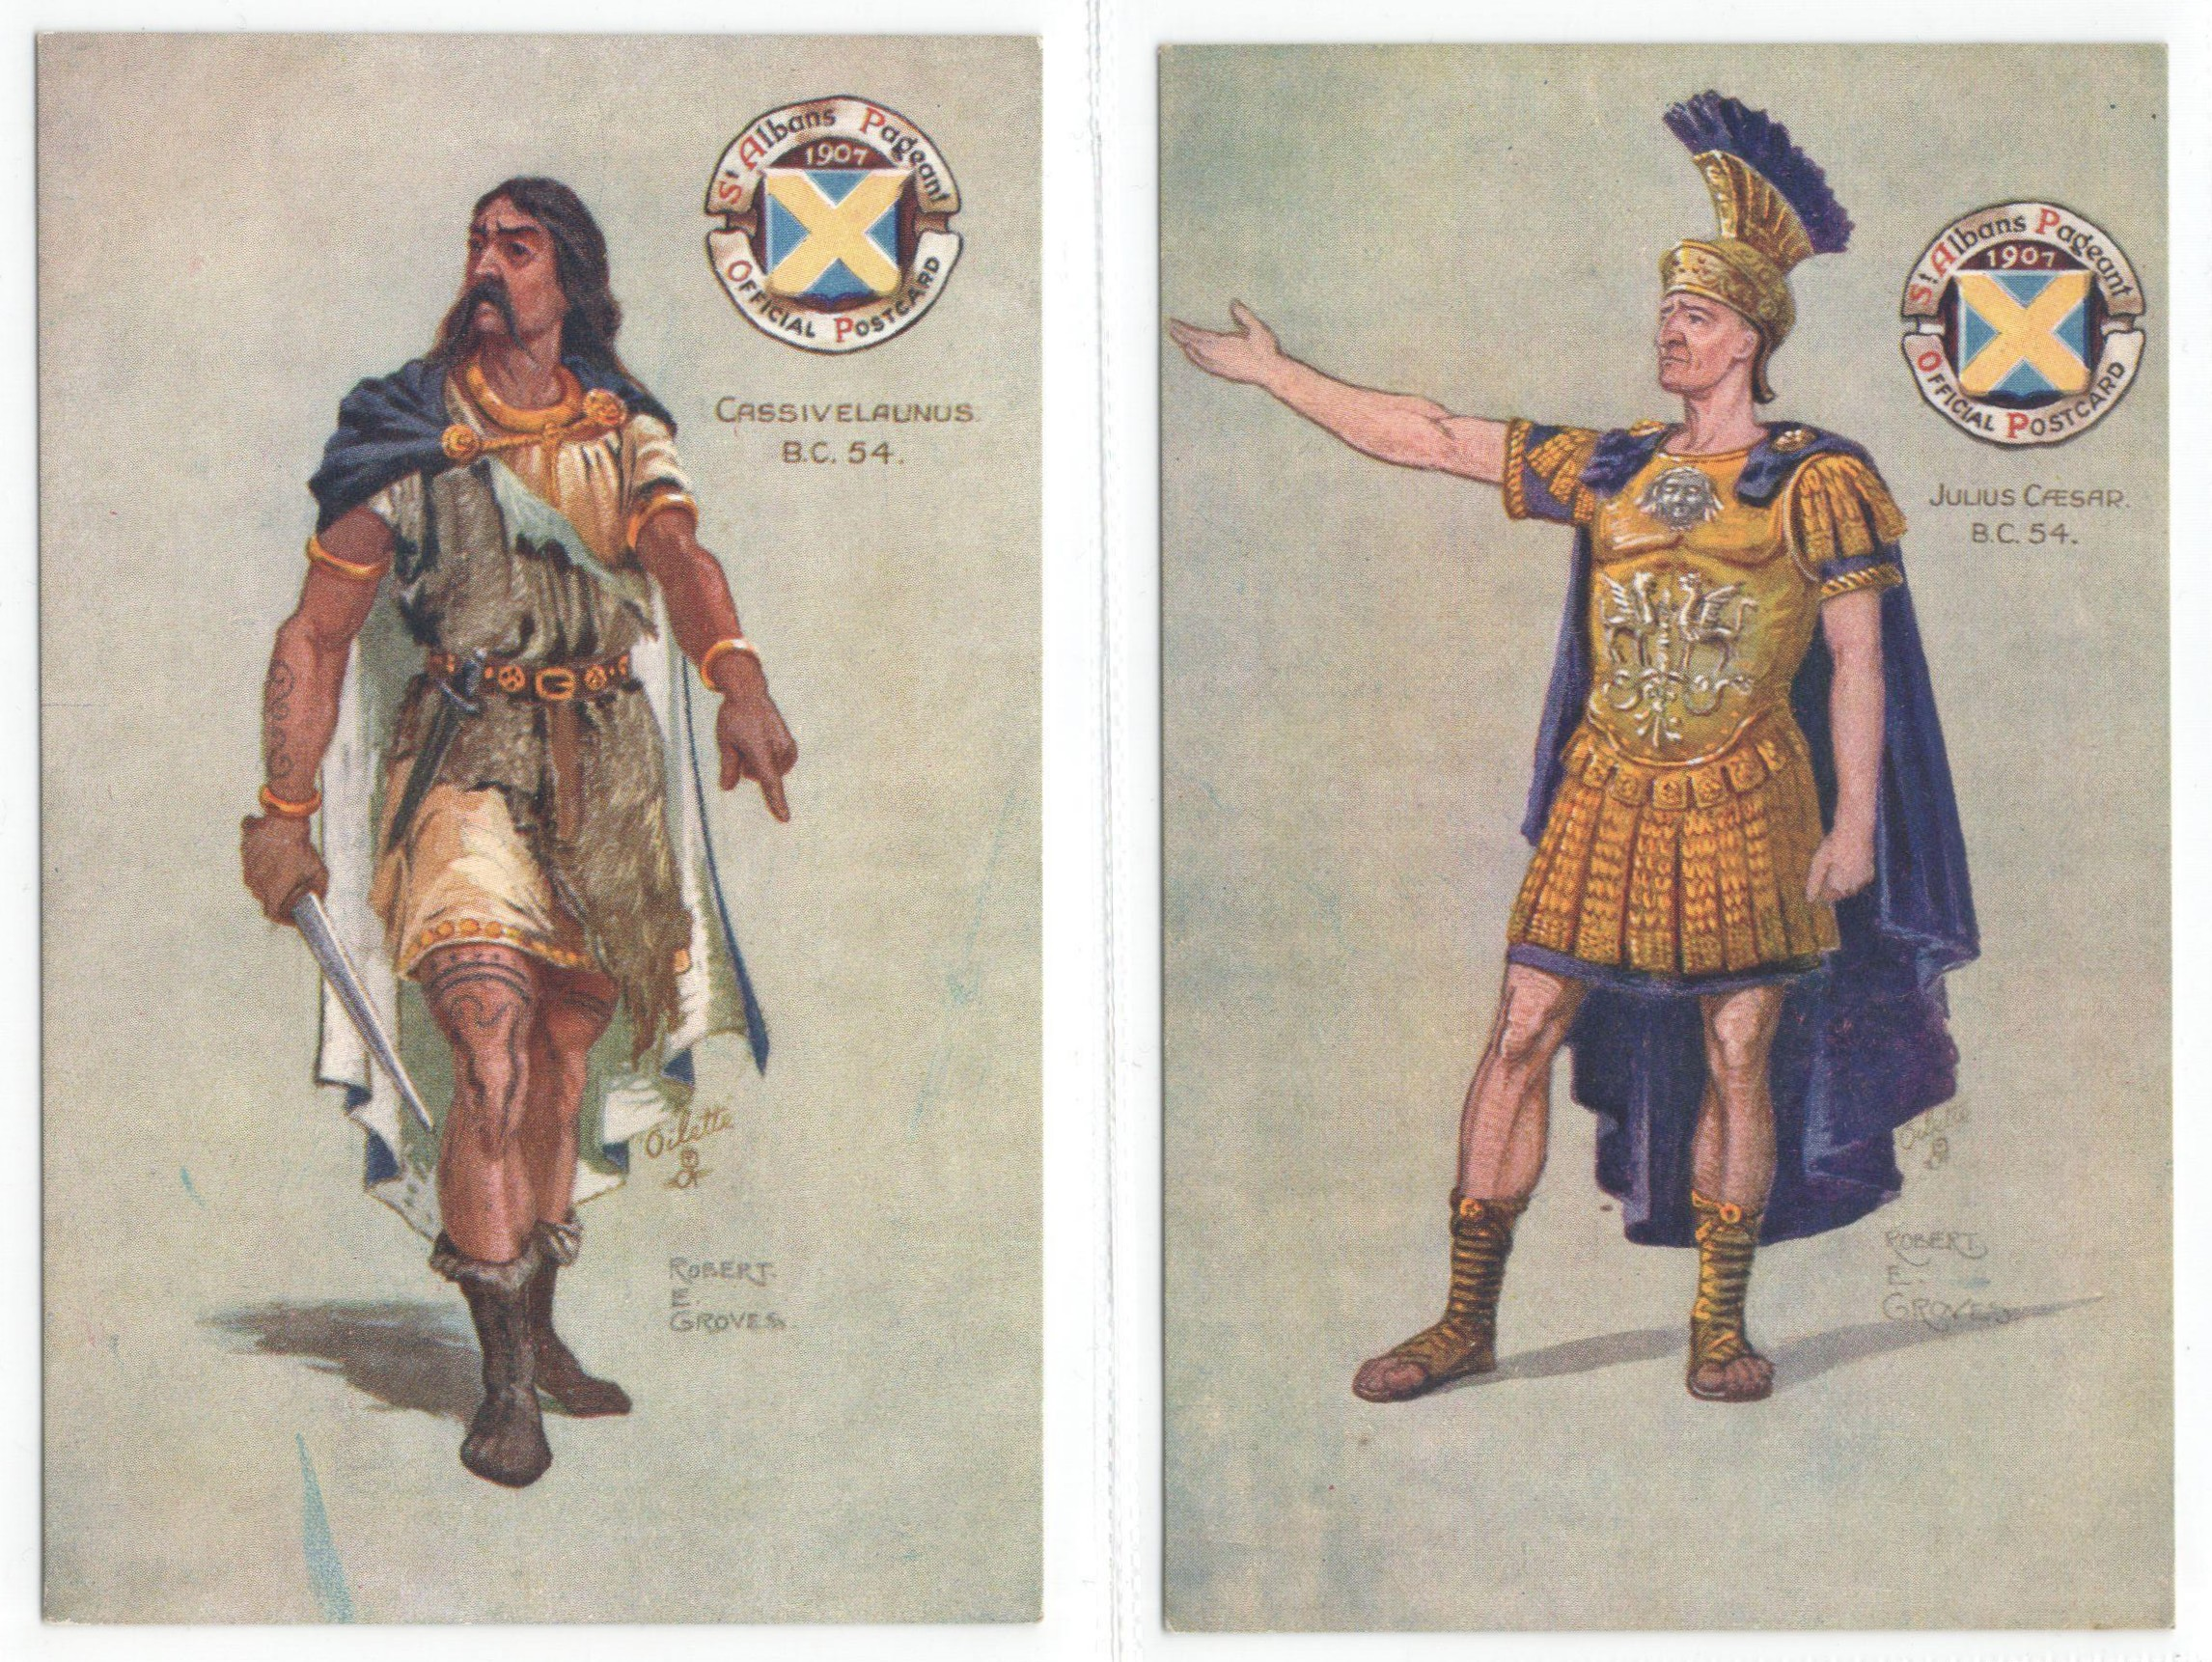 ST ALBANS PAGEANTS SERIES I, II & III - SIX RAPHAEL TUCK POSTCARDS